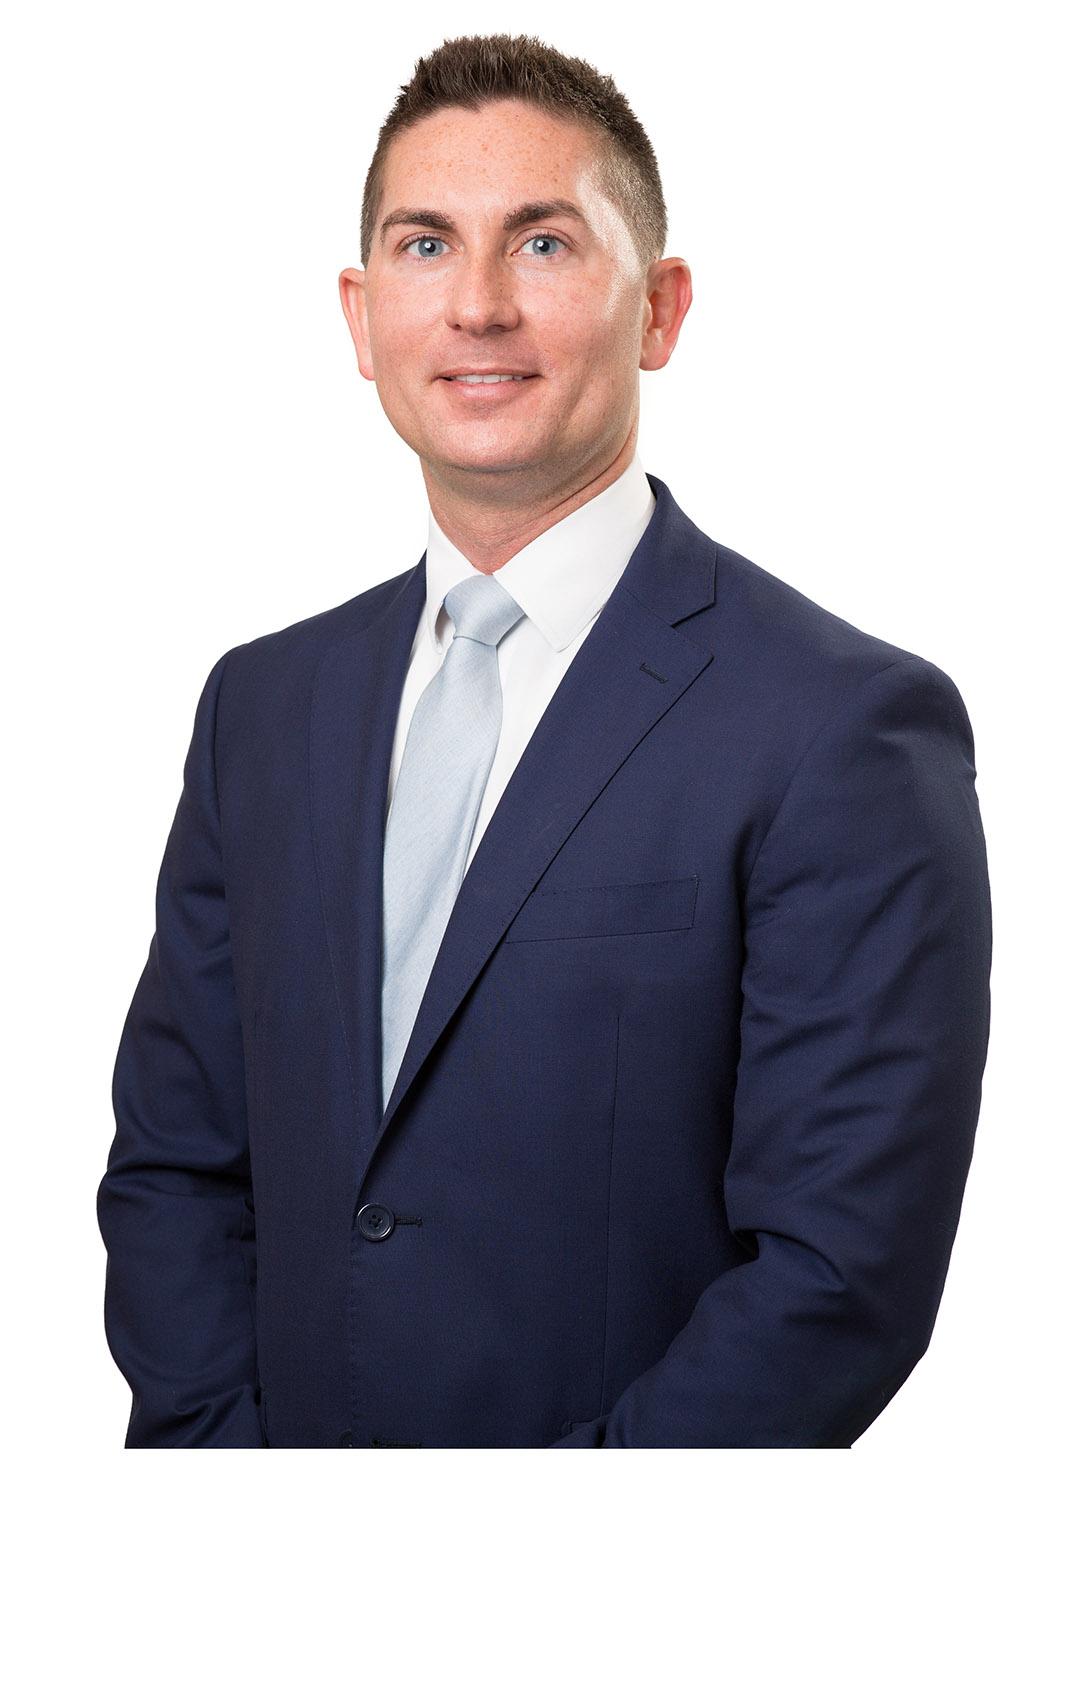 Ryan K. Todd